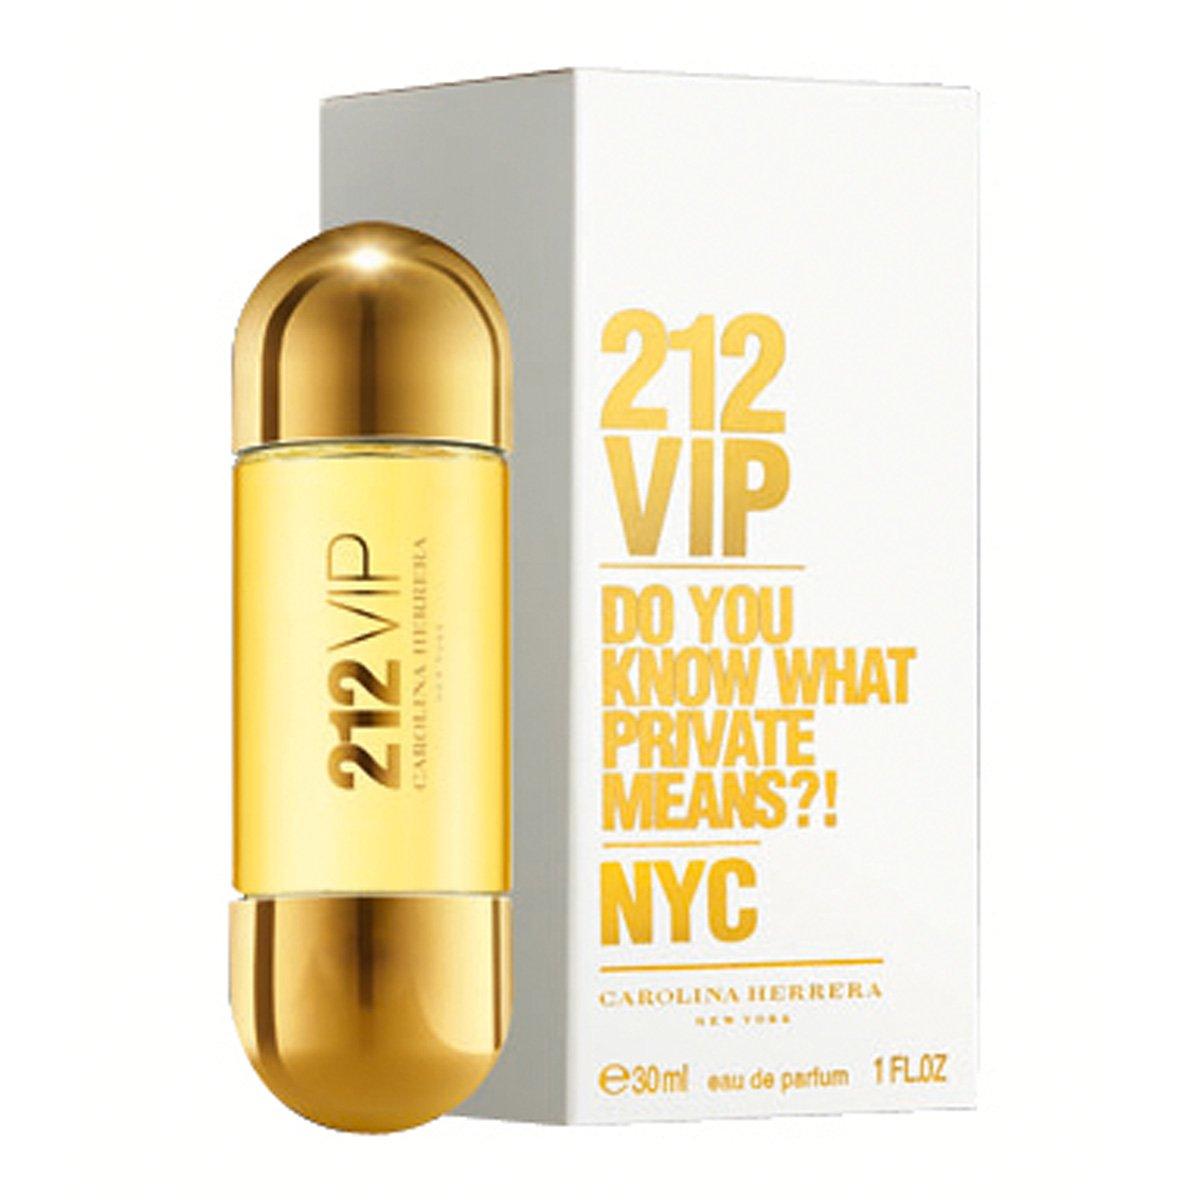 dd770e6c15 Perfume Feminino 212 VIP Carolina Herrera Eau de Parfum 30ml